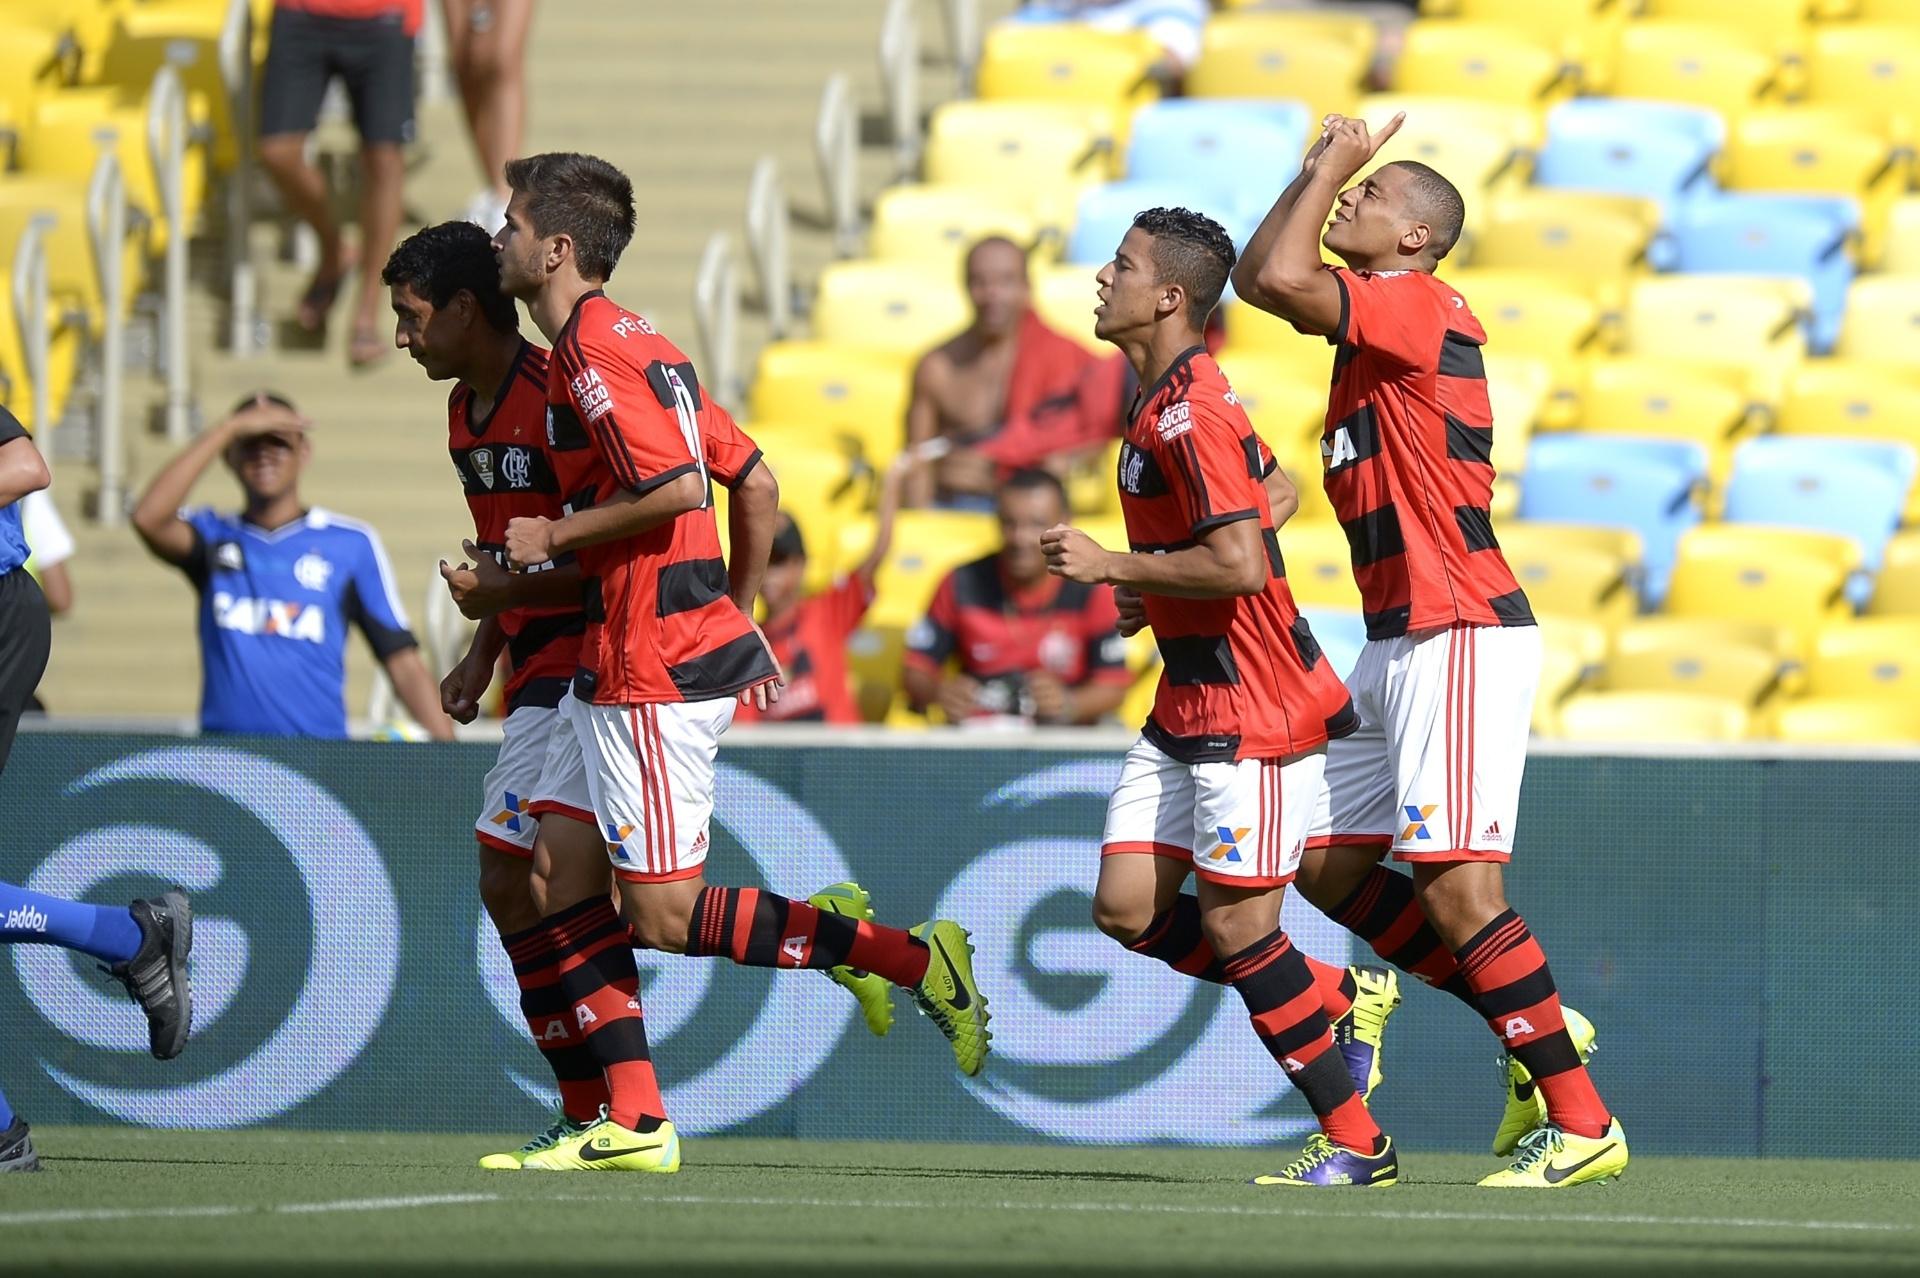 19.jan.2014 - Welinton comemora gol de abertura de placar do Flamengo sobre o Audax, na Taça Guanabara